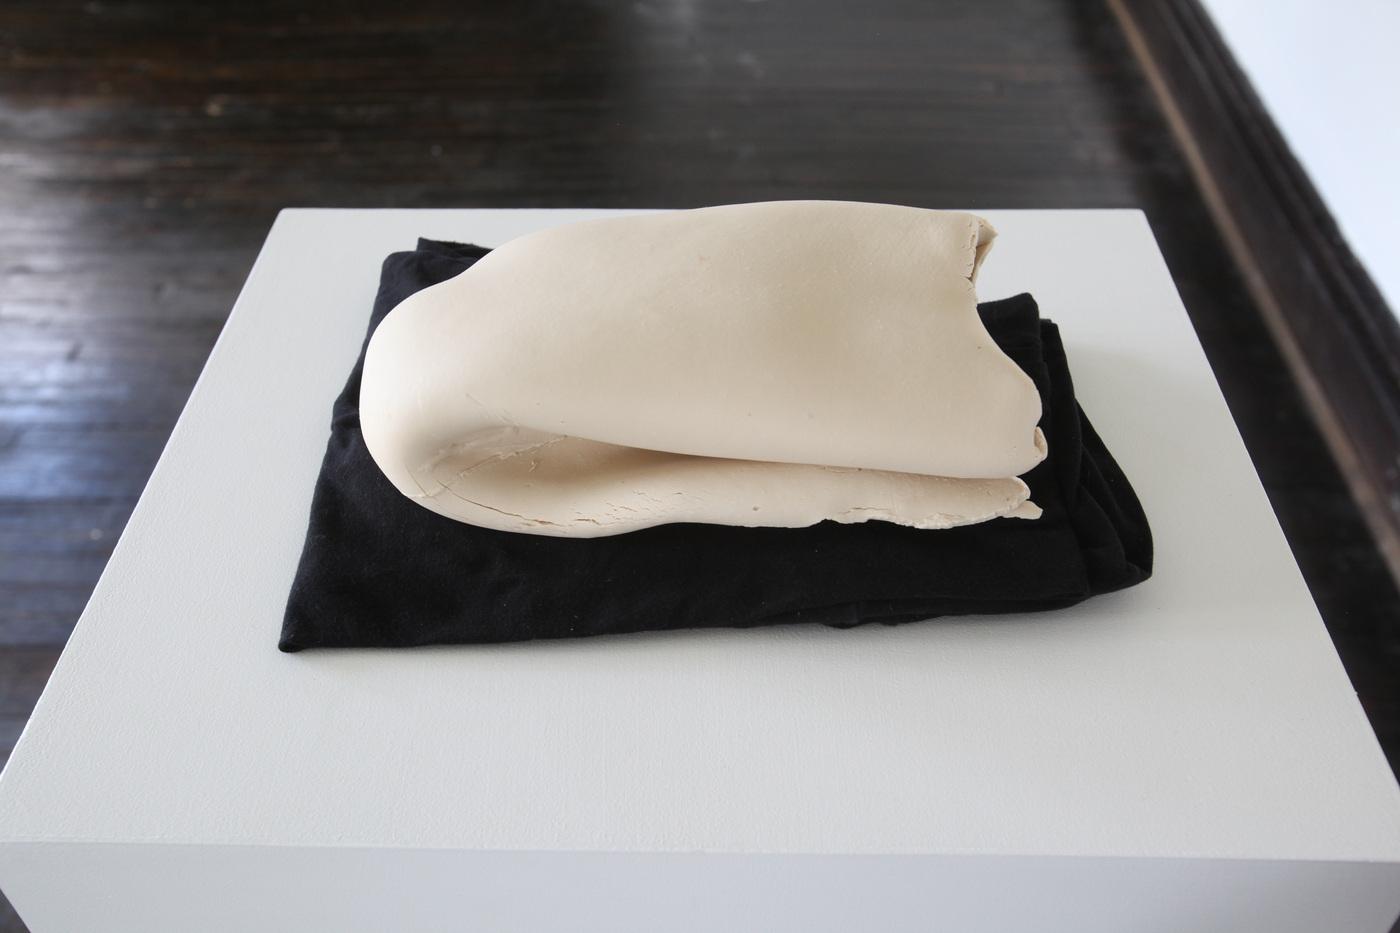 Kylie Lockwood – Folded Knee, 2016, pigmented porcelain and knit pants